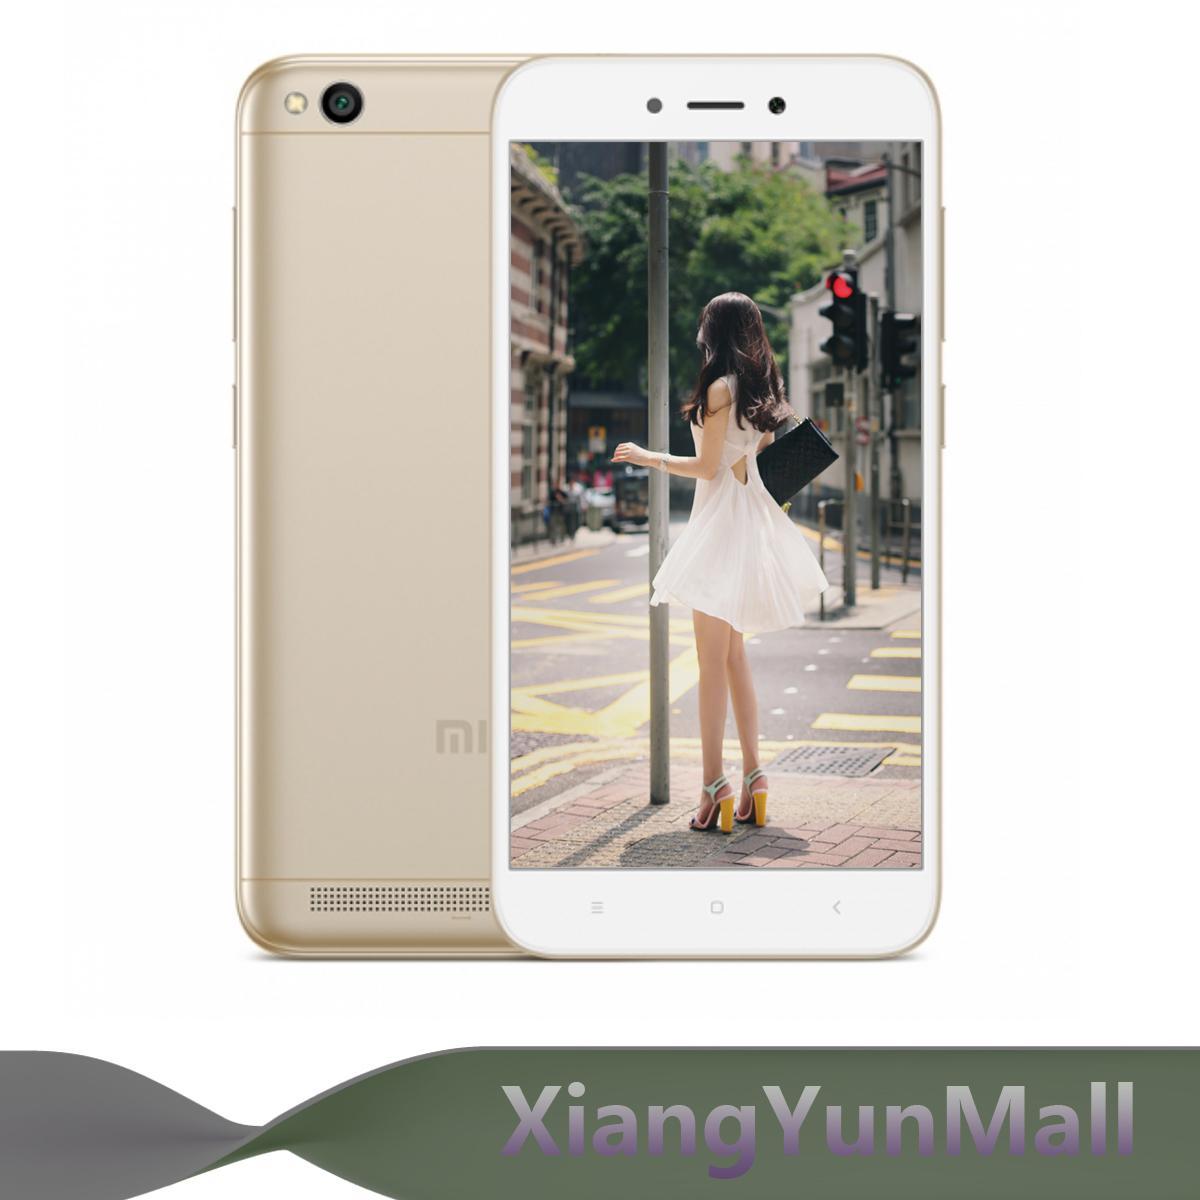 List Harga Hp Xiaomi A7 Lengkap Dan Terbaru Cek Redmi 5a  Garansi Resmi Tam 2gb 16gb Quad Core 5 Inch Screen Smart Phone